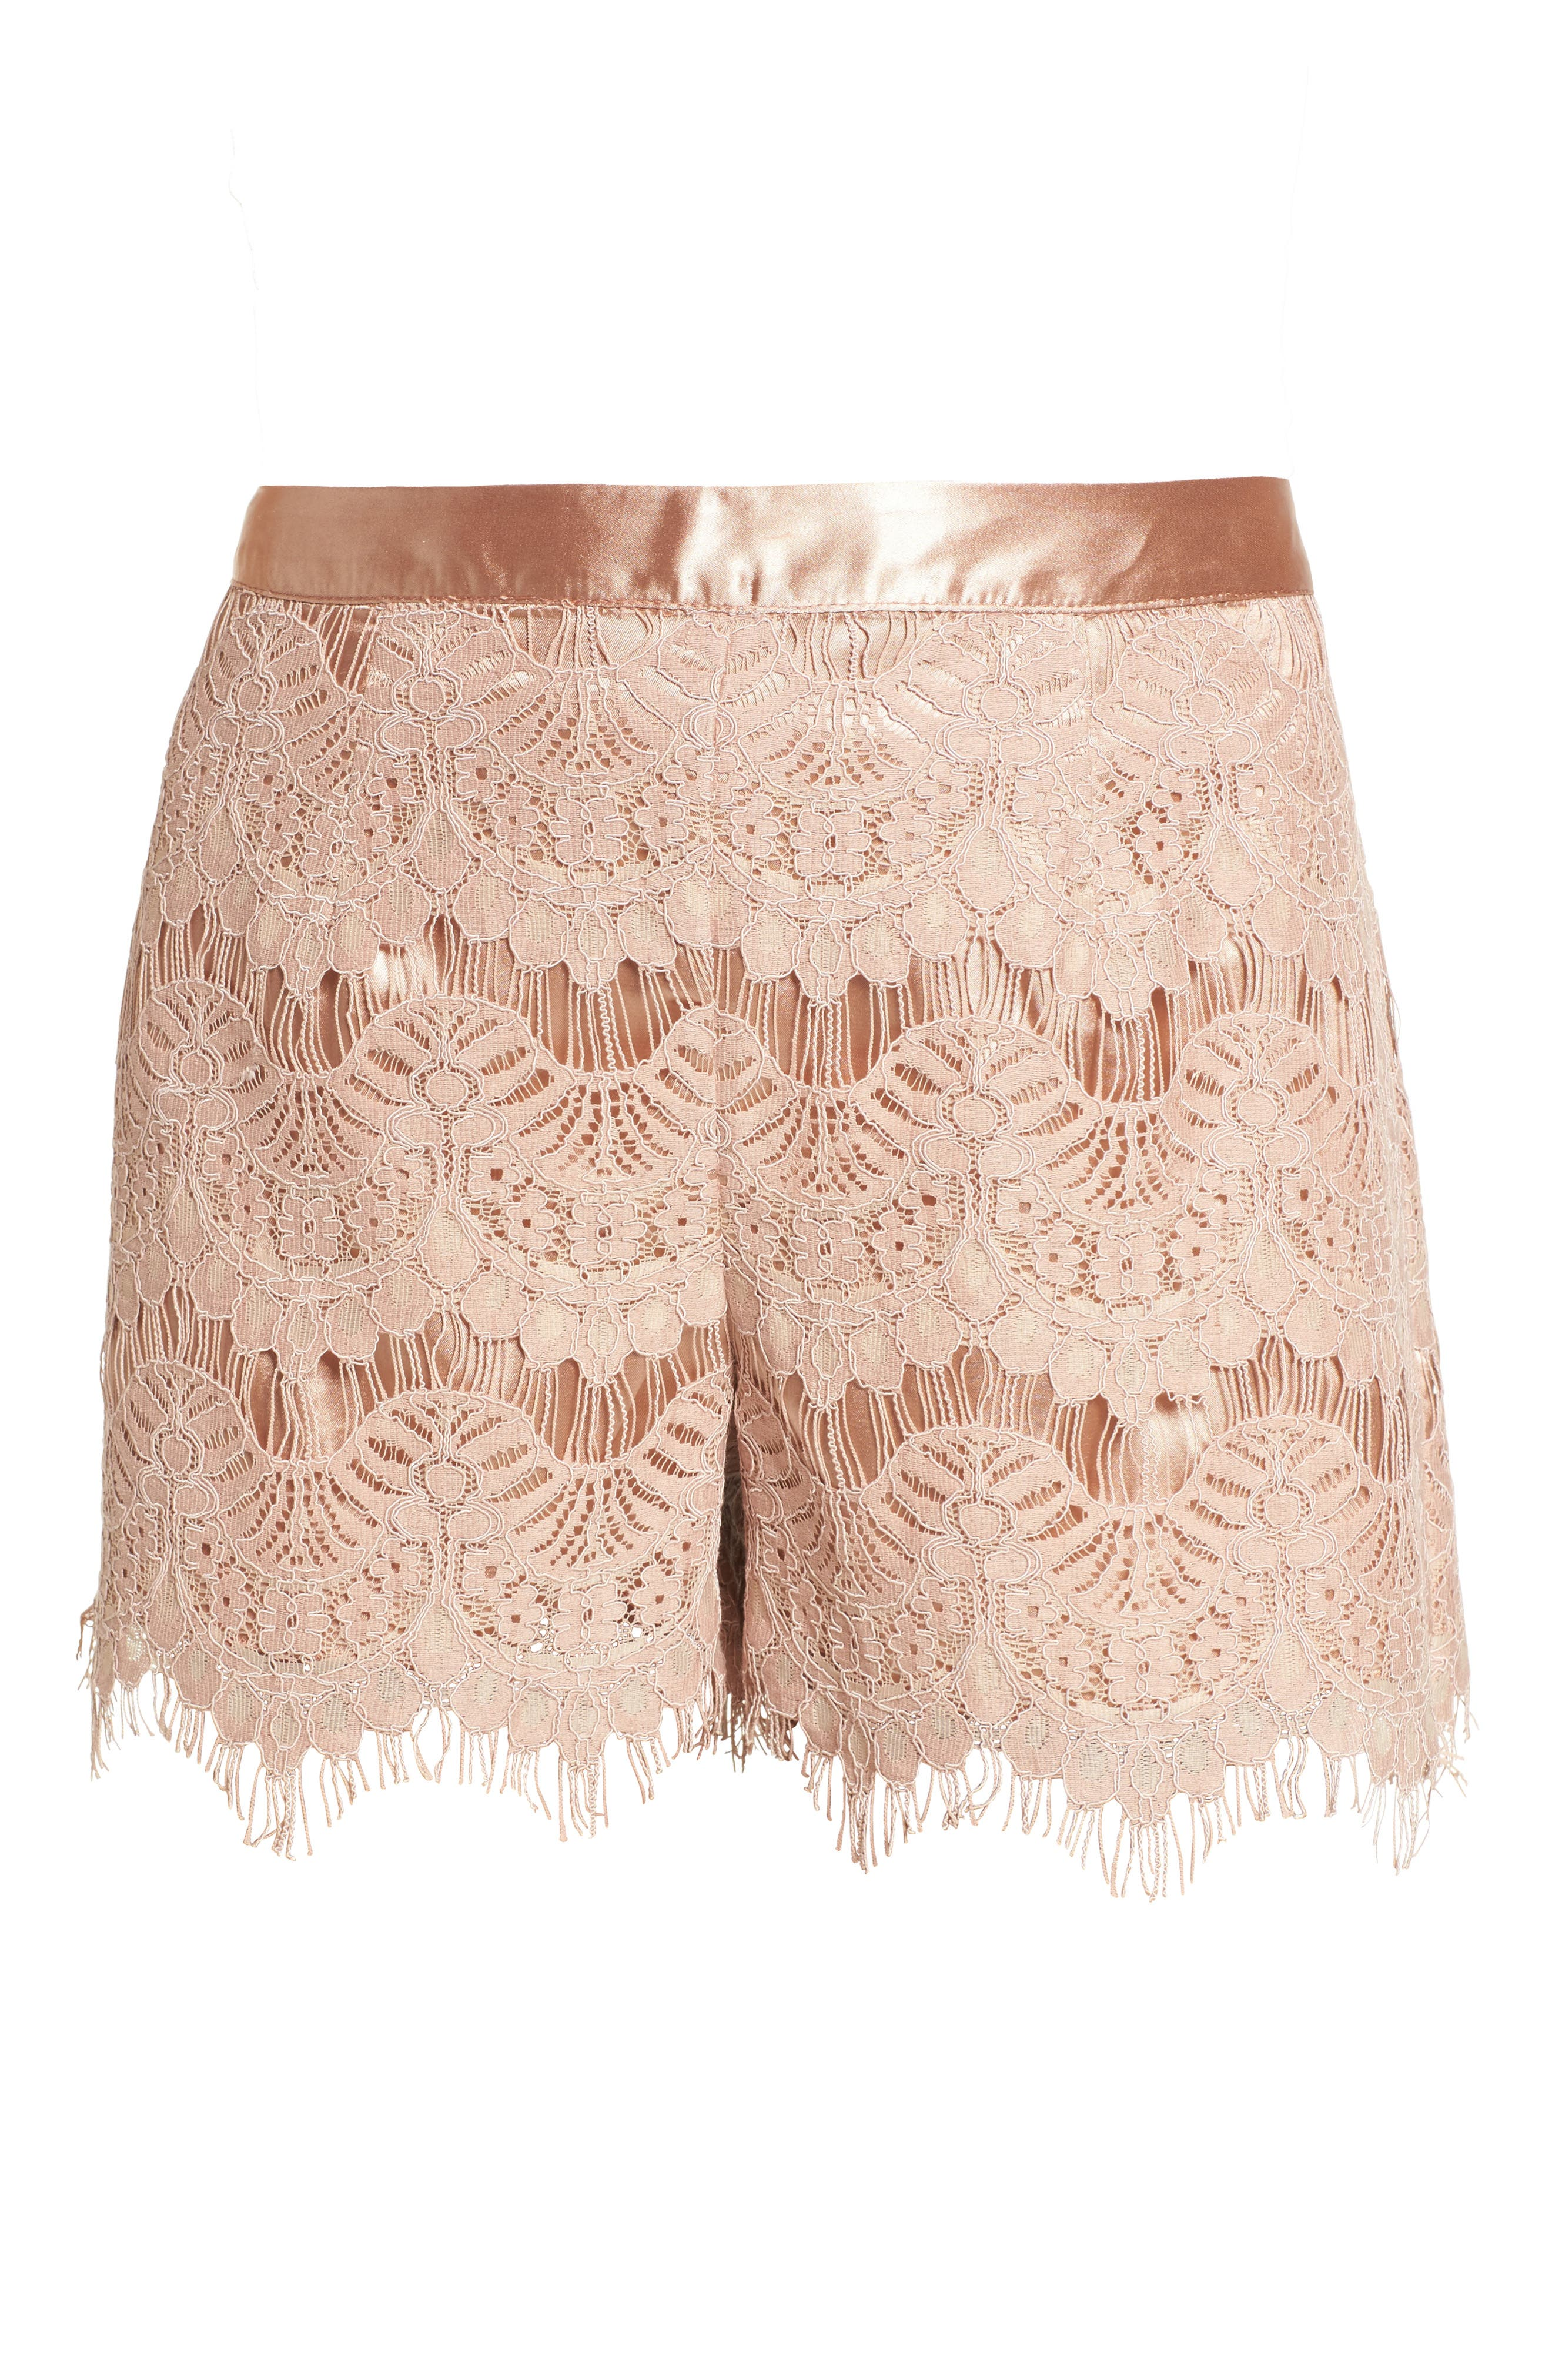 Lace Shorts,                             Alternate thumbnail 6, color,                             680